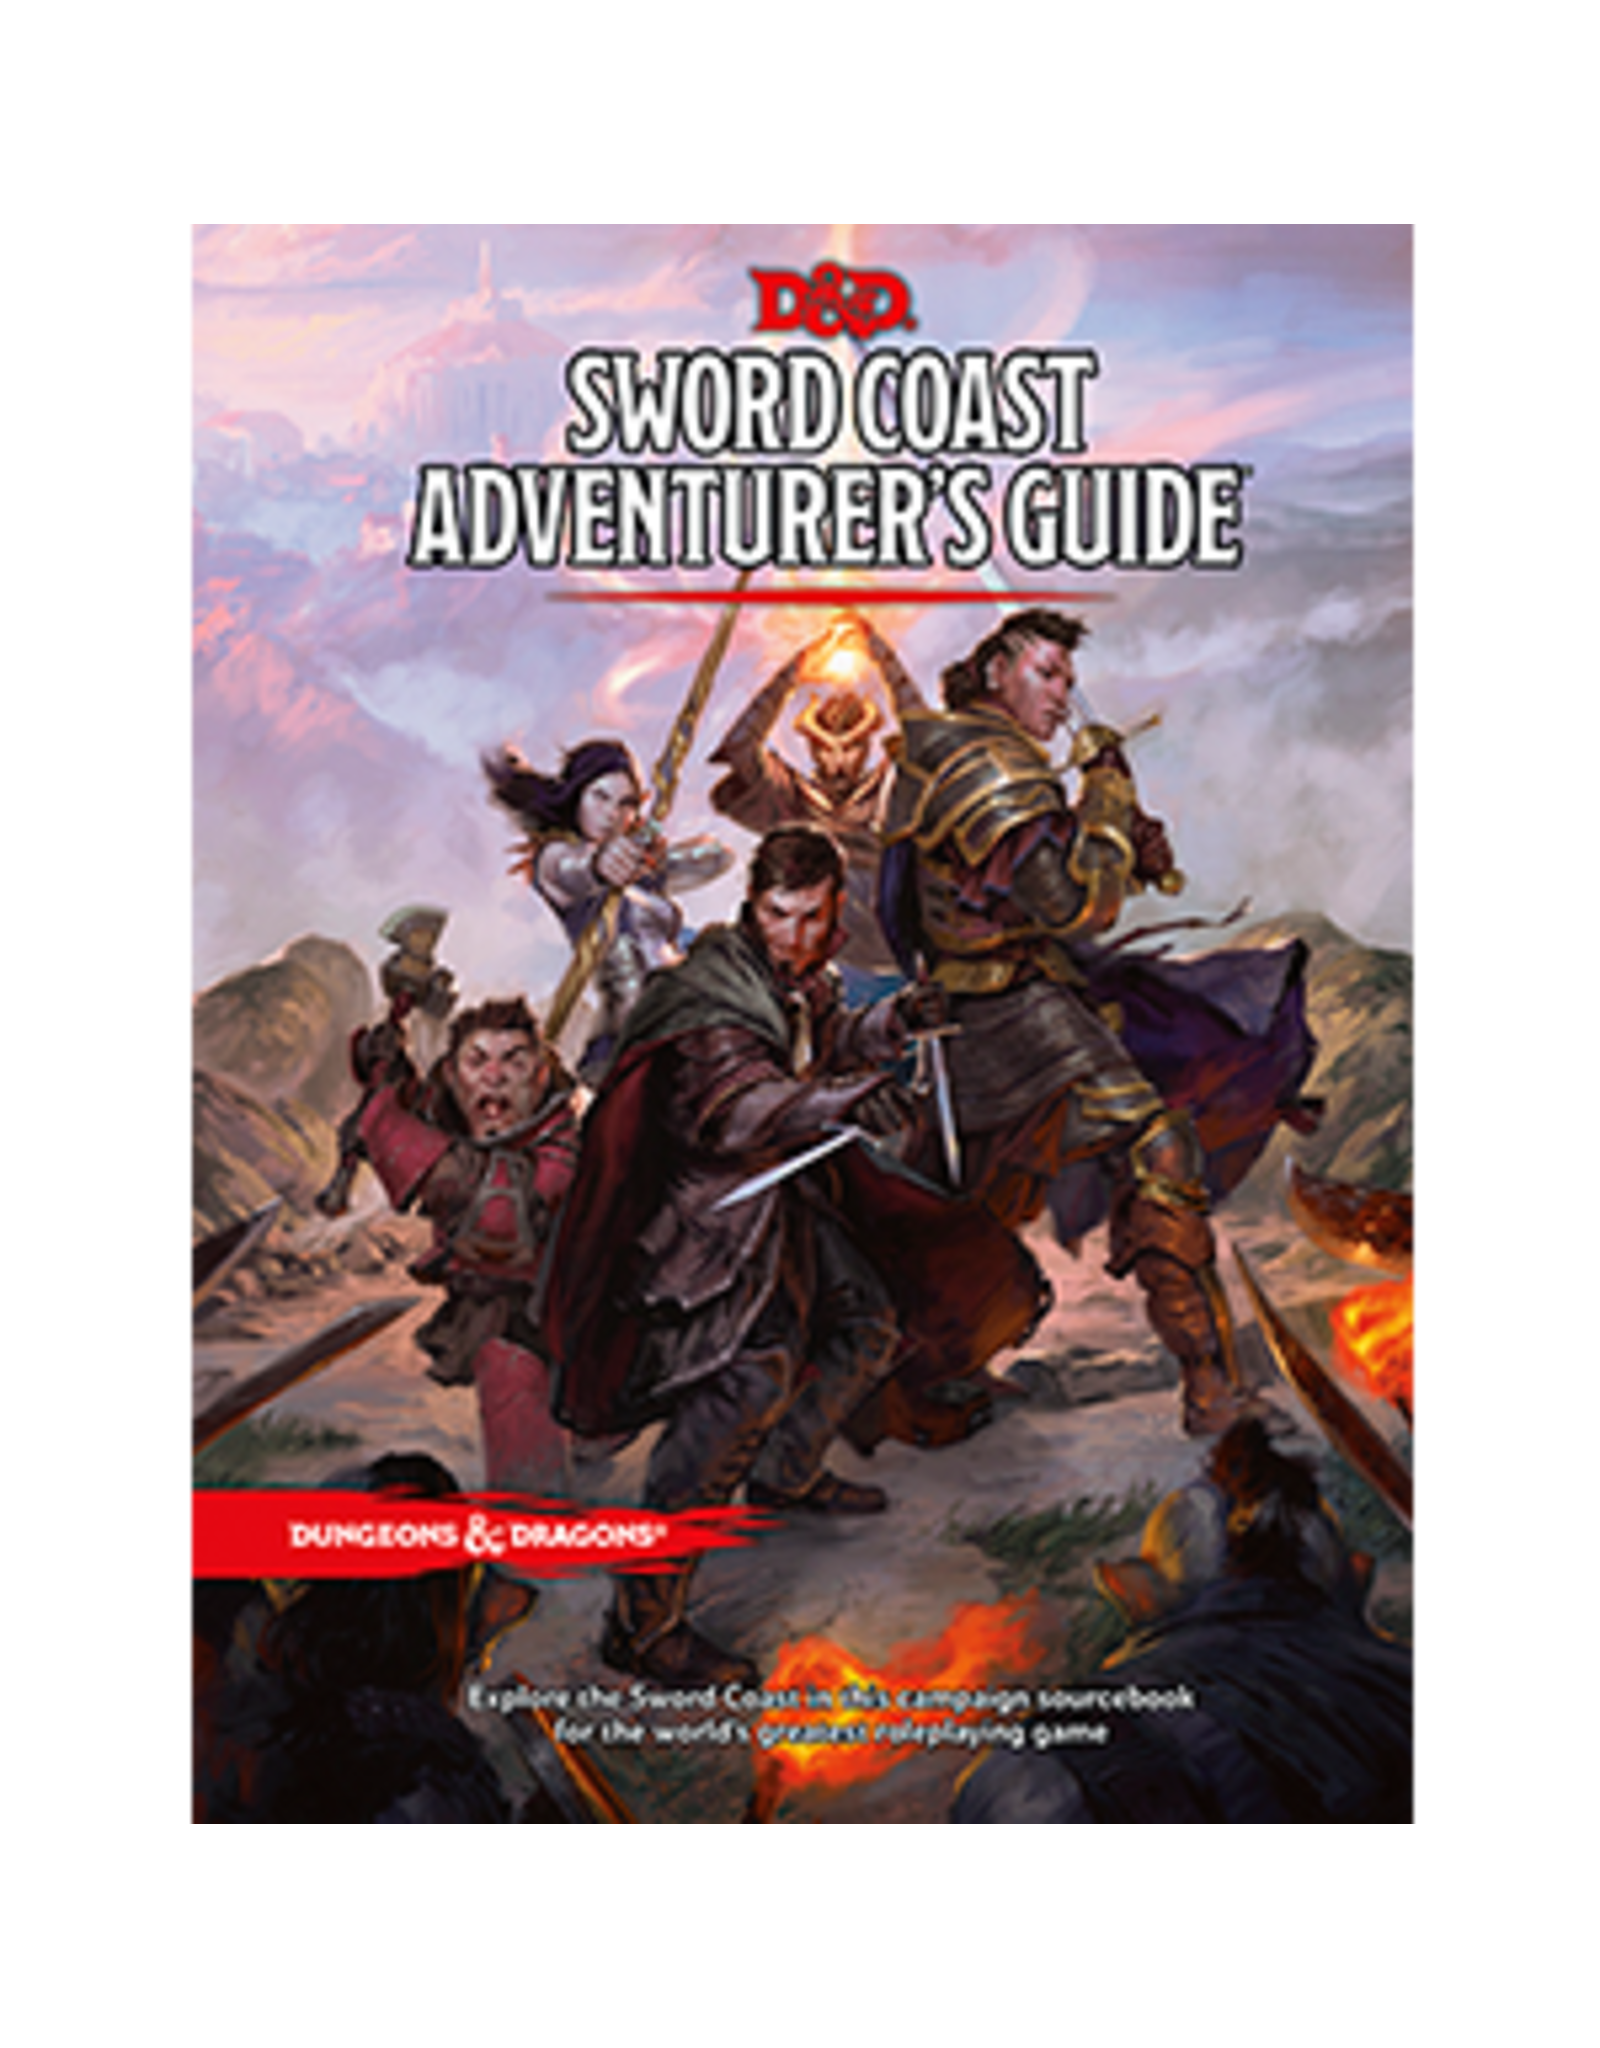 D&D: Sword Coast Adventure Guide